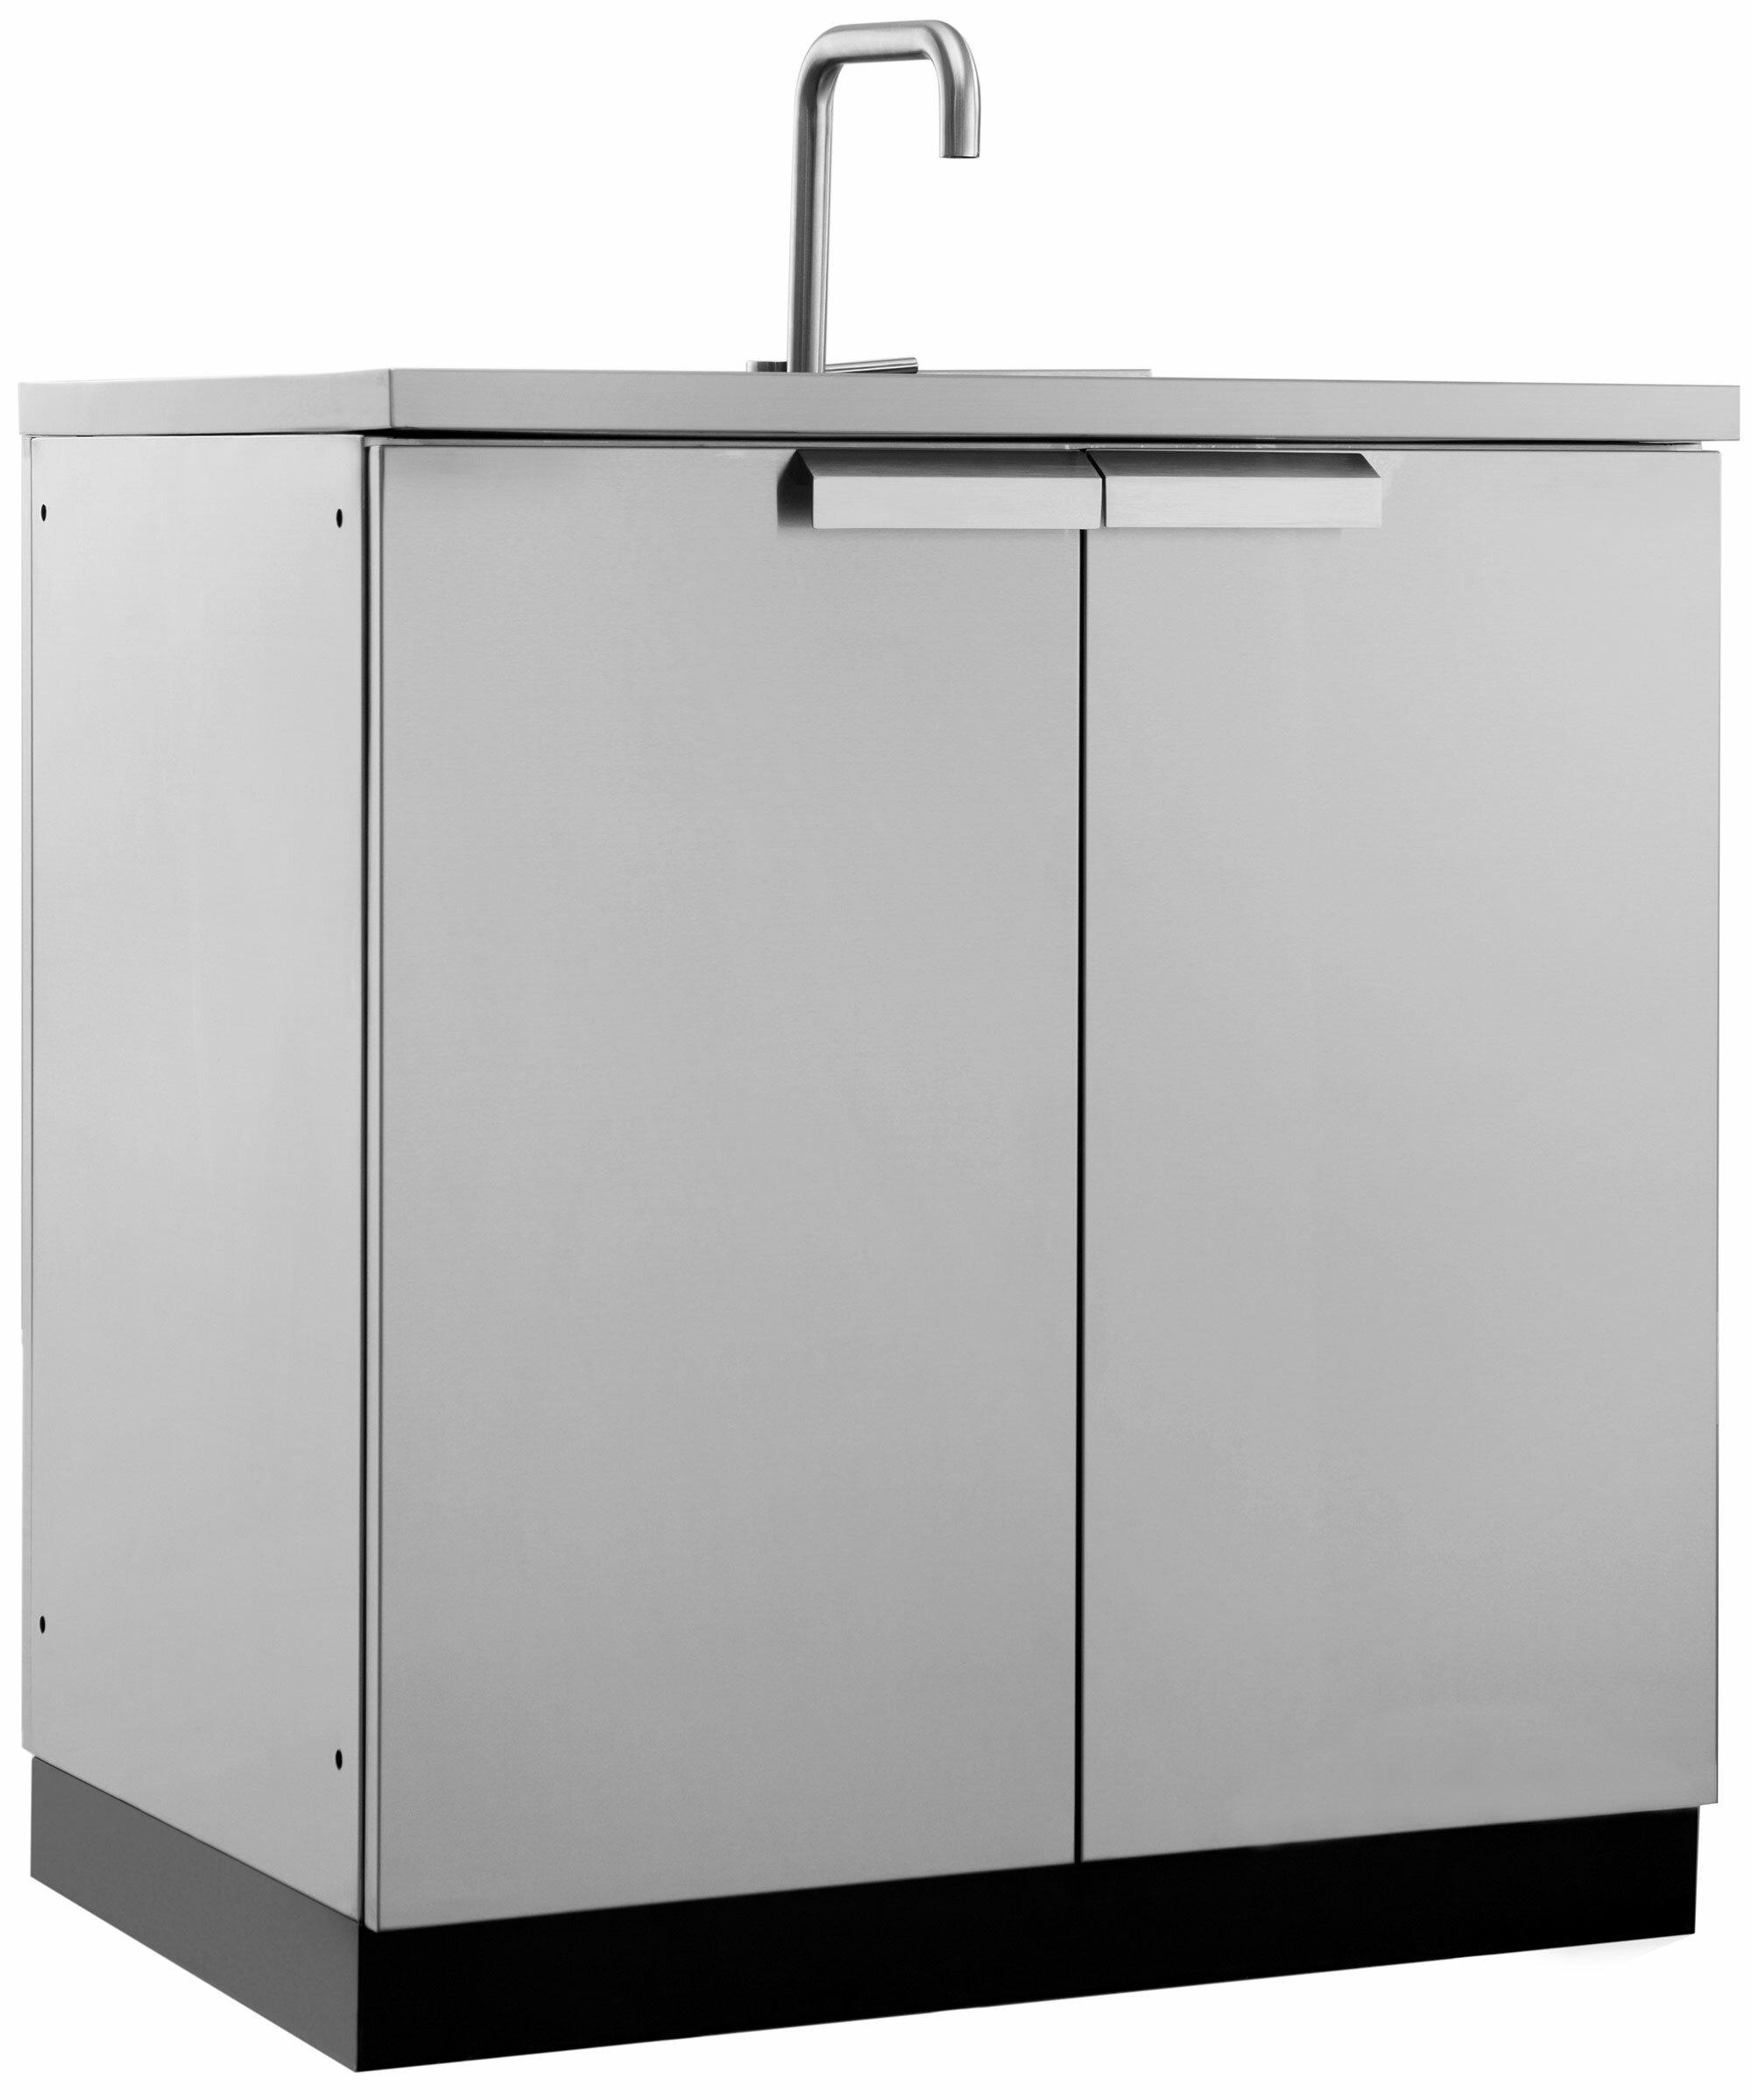 Newage Products Outdoor Kitchen Freestanding Sink Reviews Wayfair